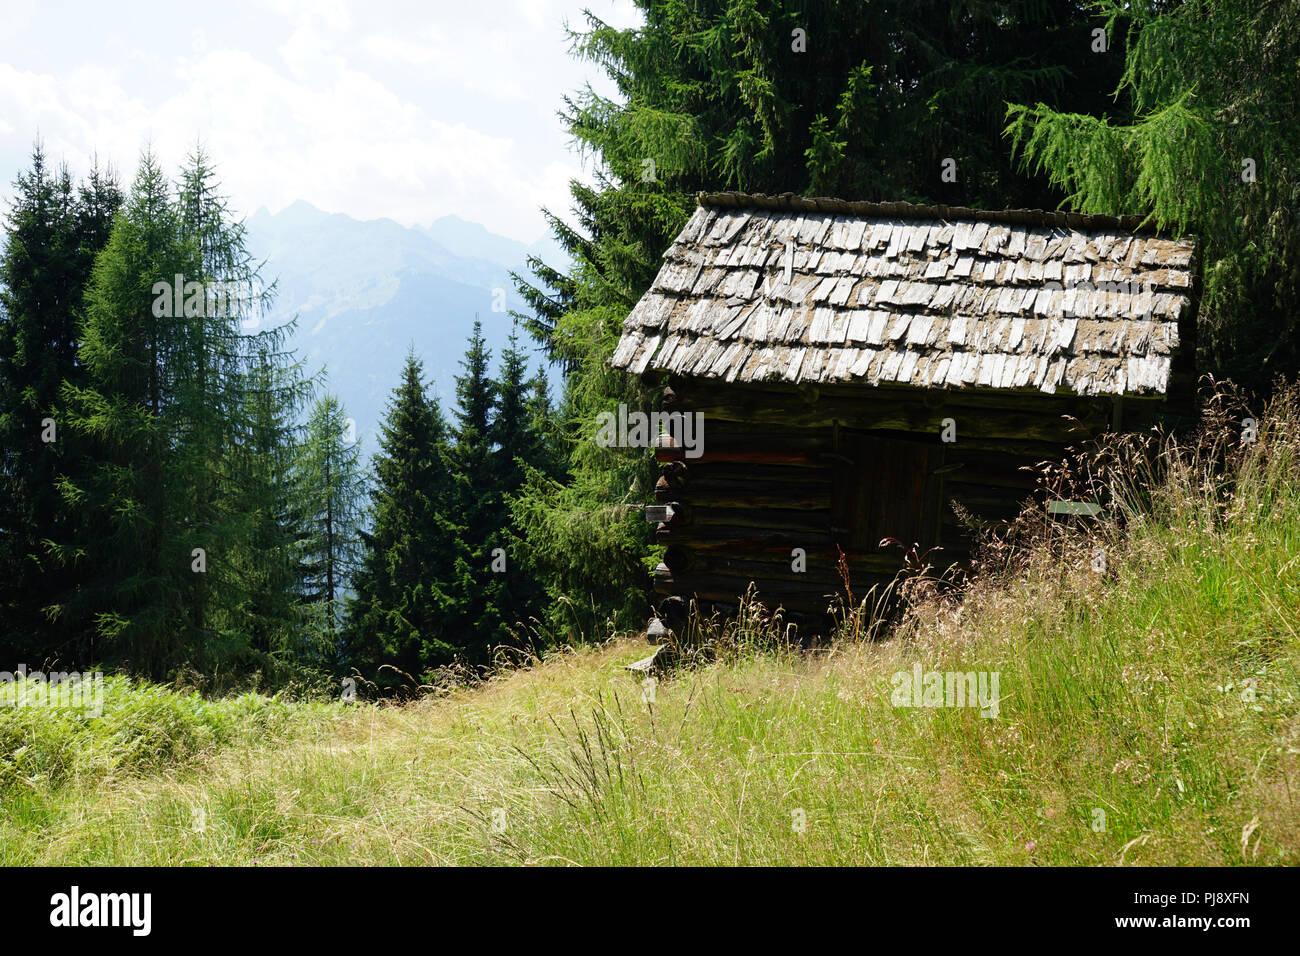 Heuschober, Lesachtal, Kärnten, Österreich - Stock Image